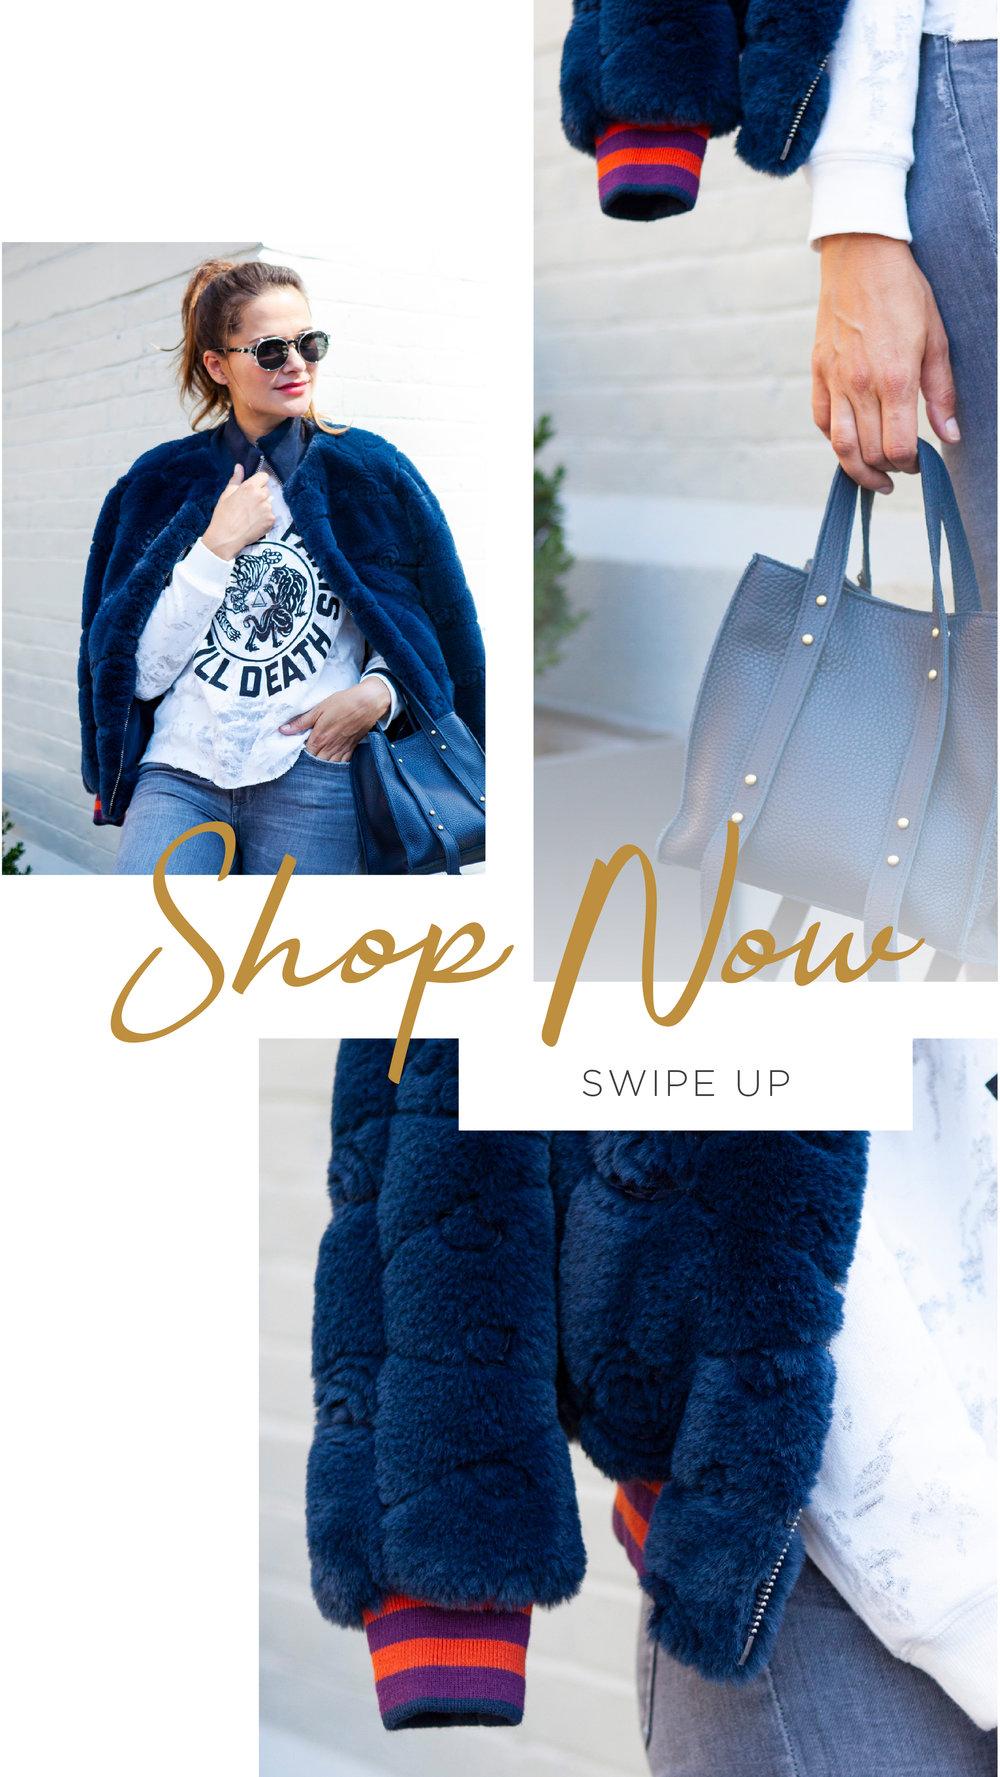 MARCUS_Social_Eleven Paris Fur Coat-03.jpg